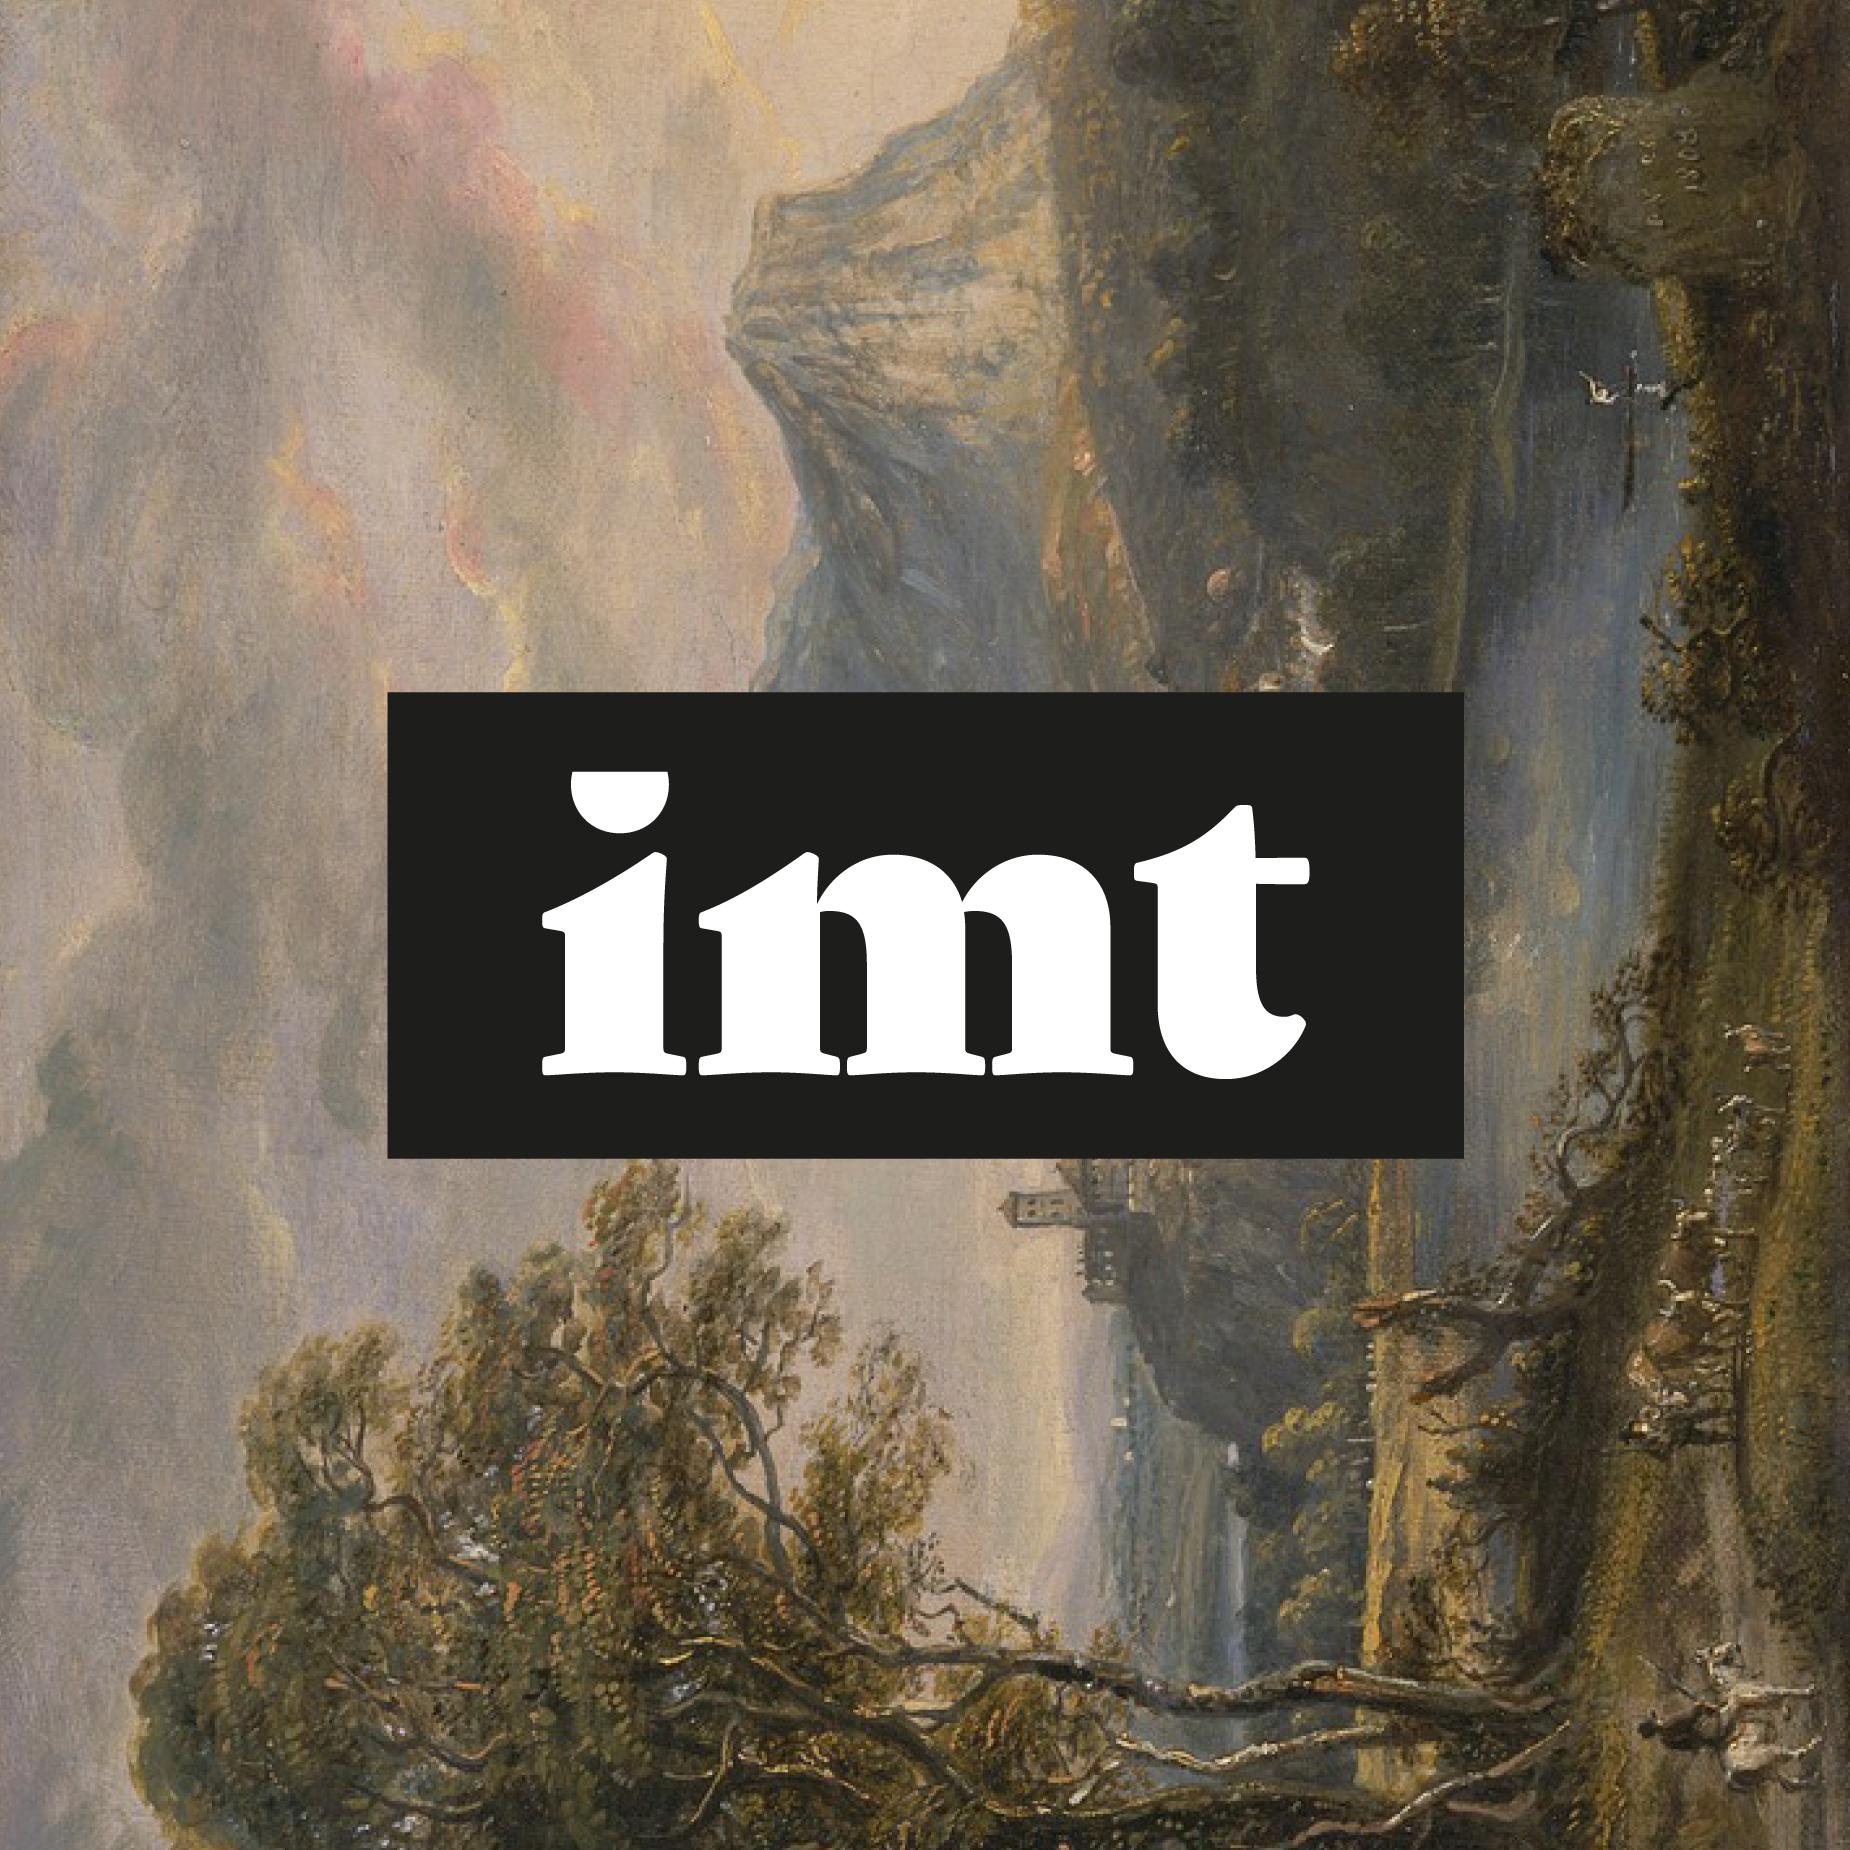 New work — Unused Identity.imt.#logo #logos #logodesigner #logodesign #design #designer #designagency #london #dorset #identity #branding #brand #agency #graphicdesign #graphicdesigner #brandingagency #type #typography #designinspiration